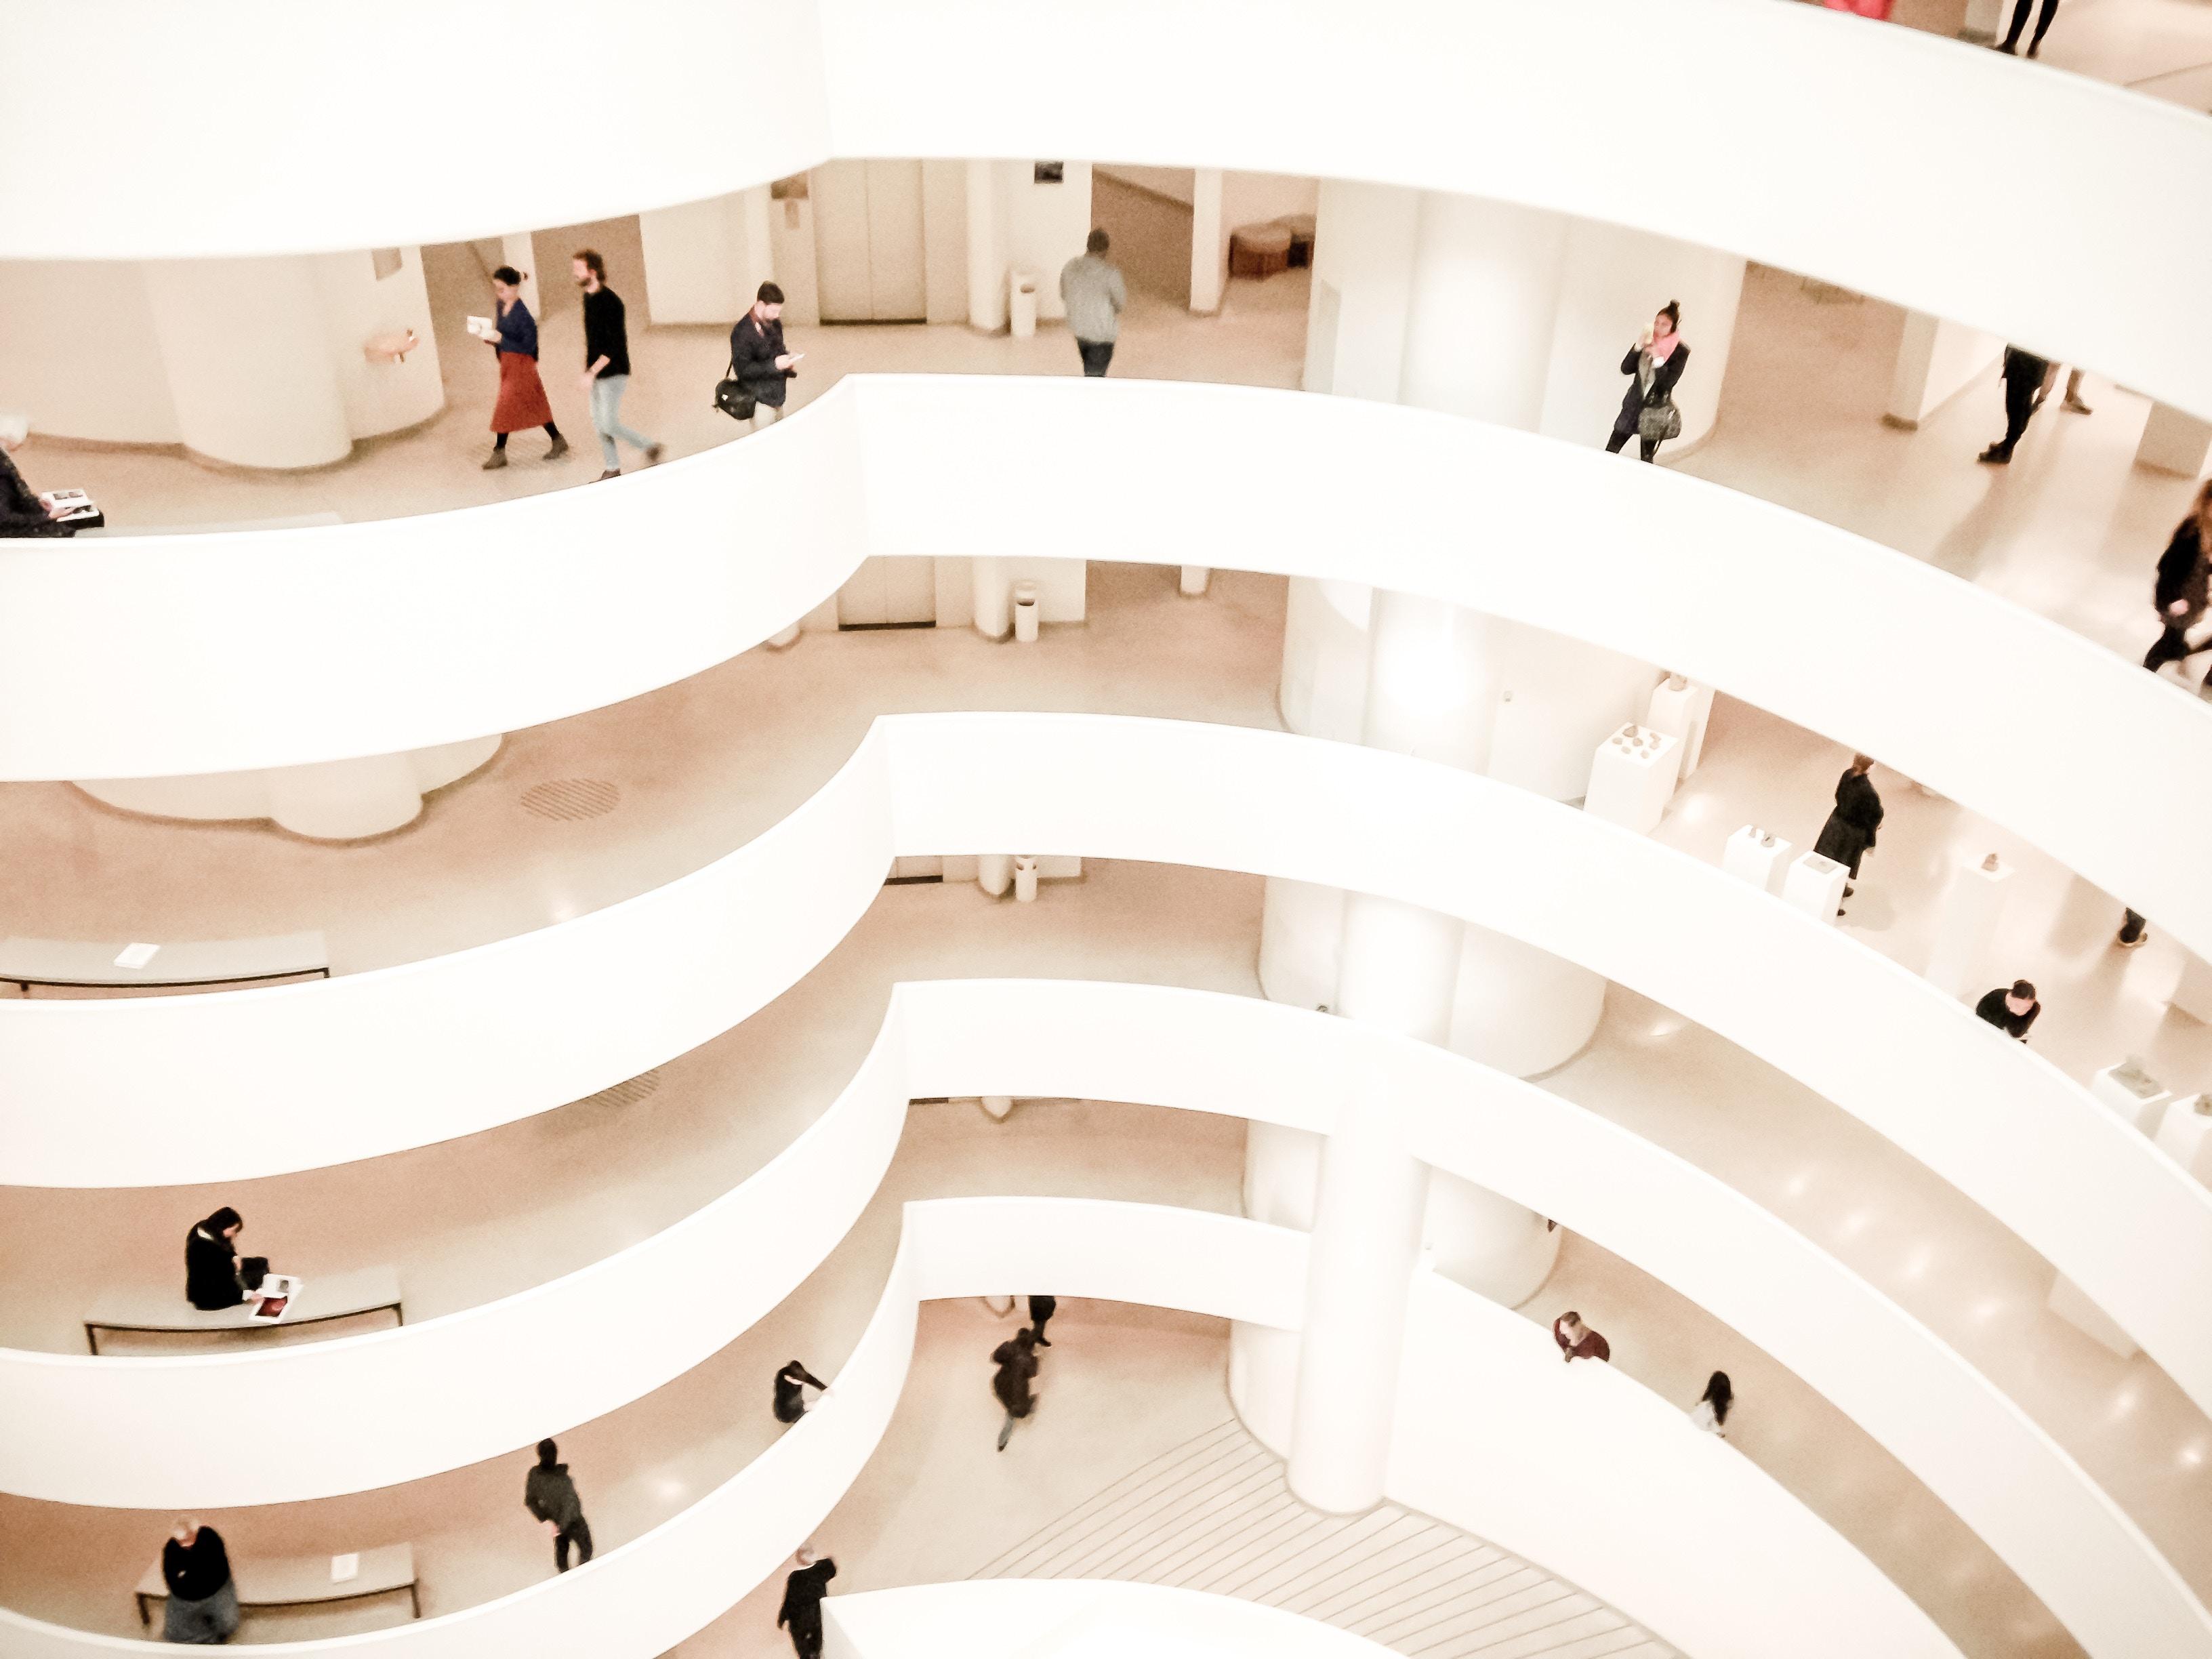 Das Guggenheim Museum, New York